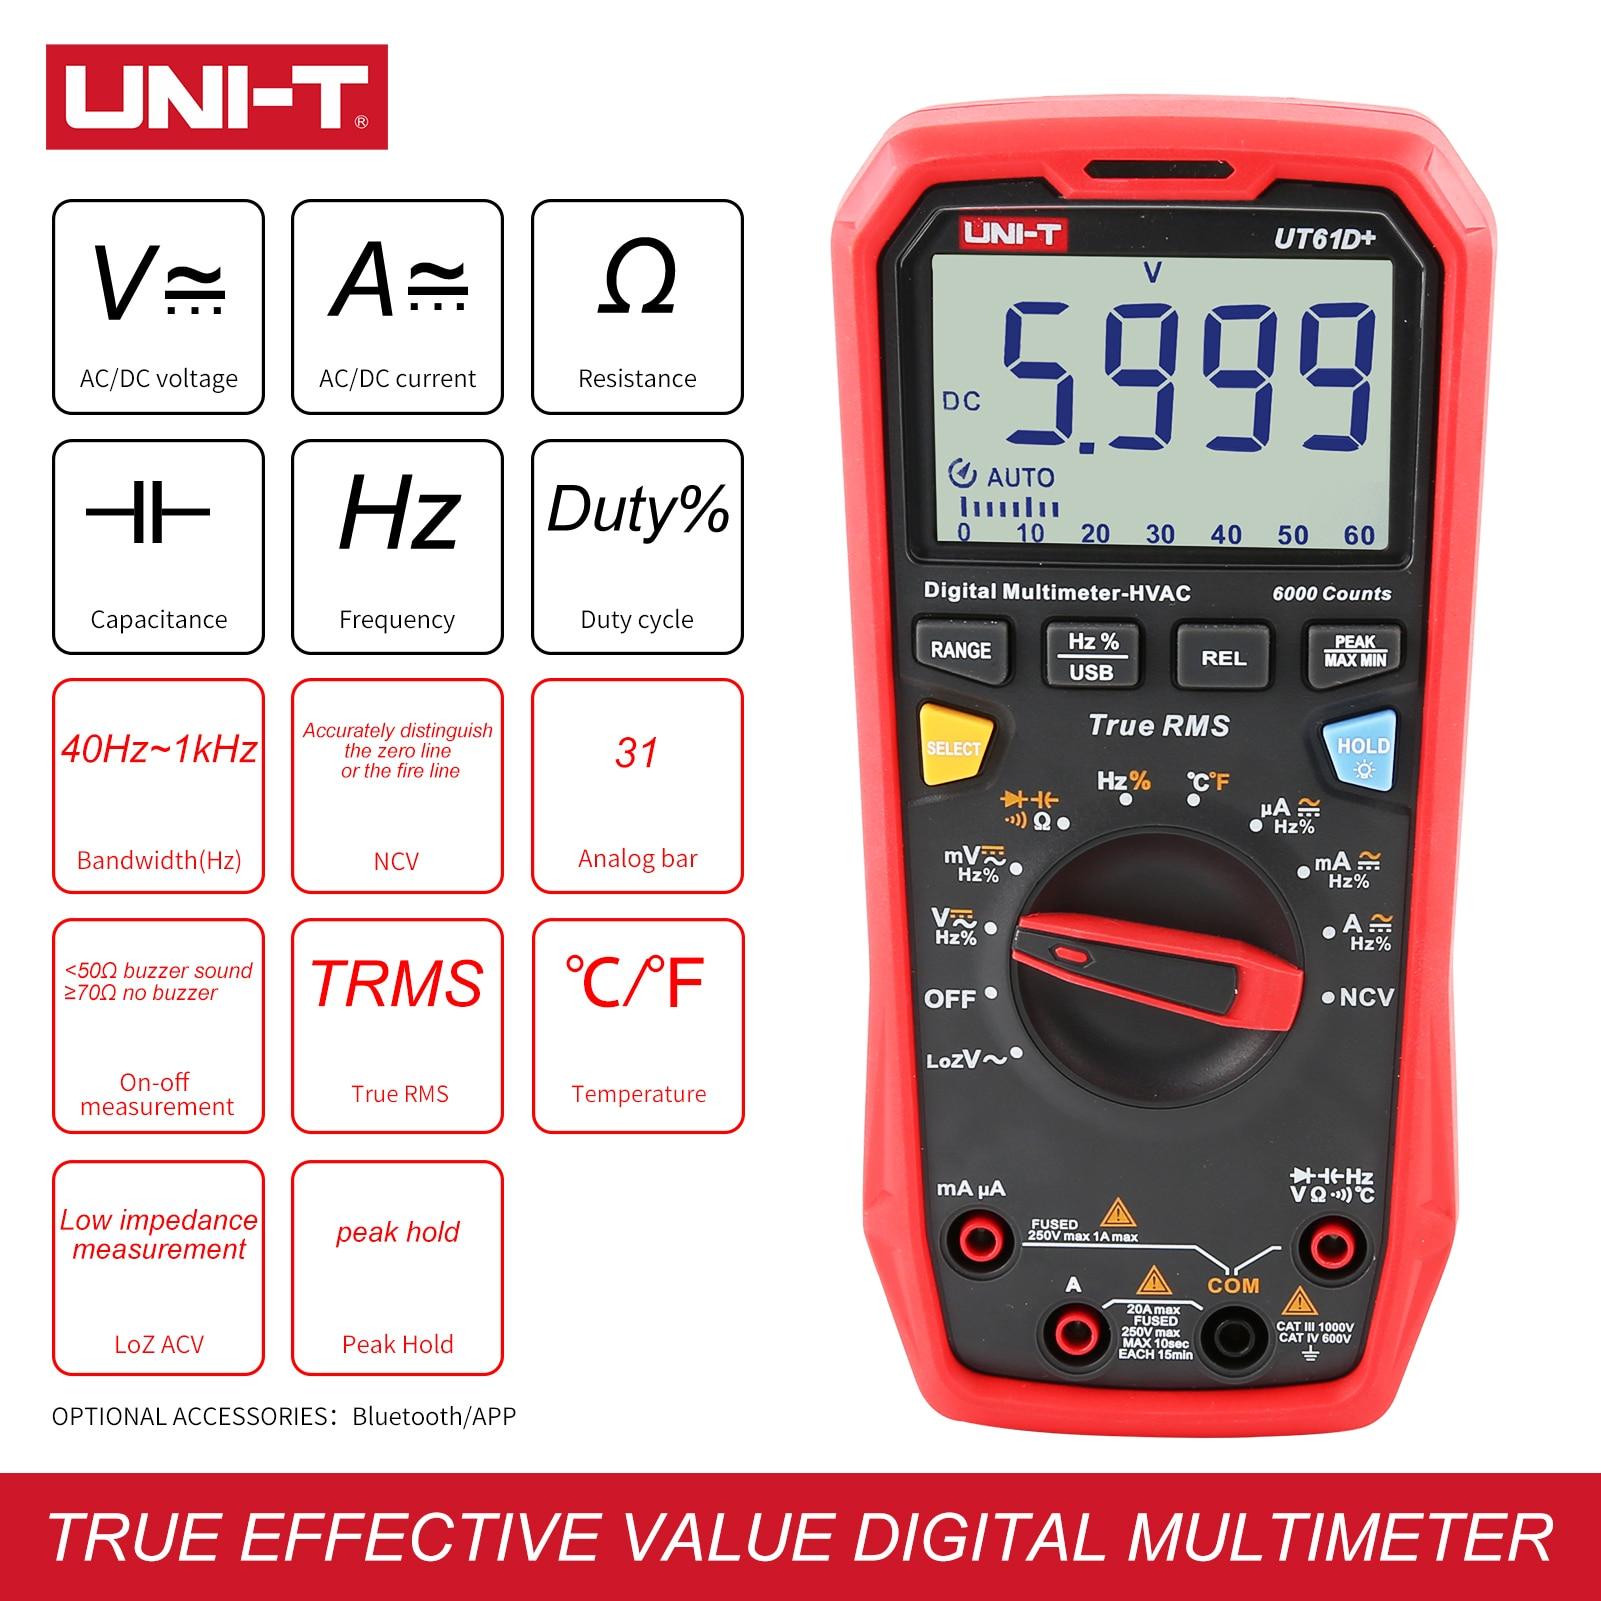 UNI-T UT61D+ Digital Multimeter 1000V True RMS C/DC Voltage Current Resistance Capacitance Tester